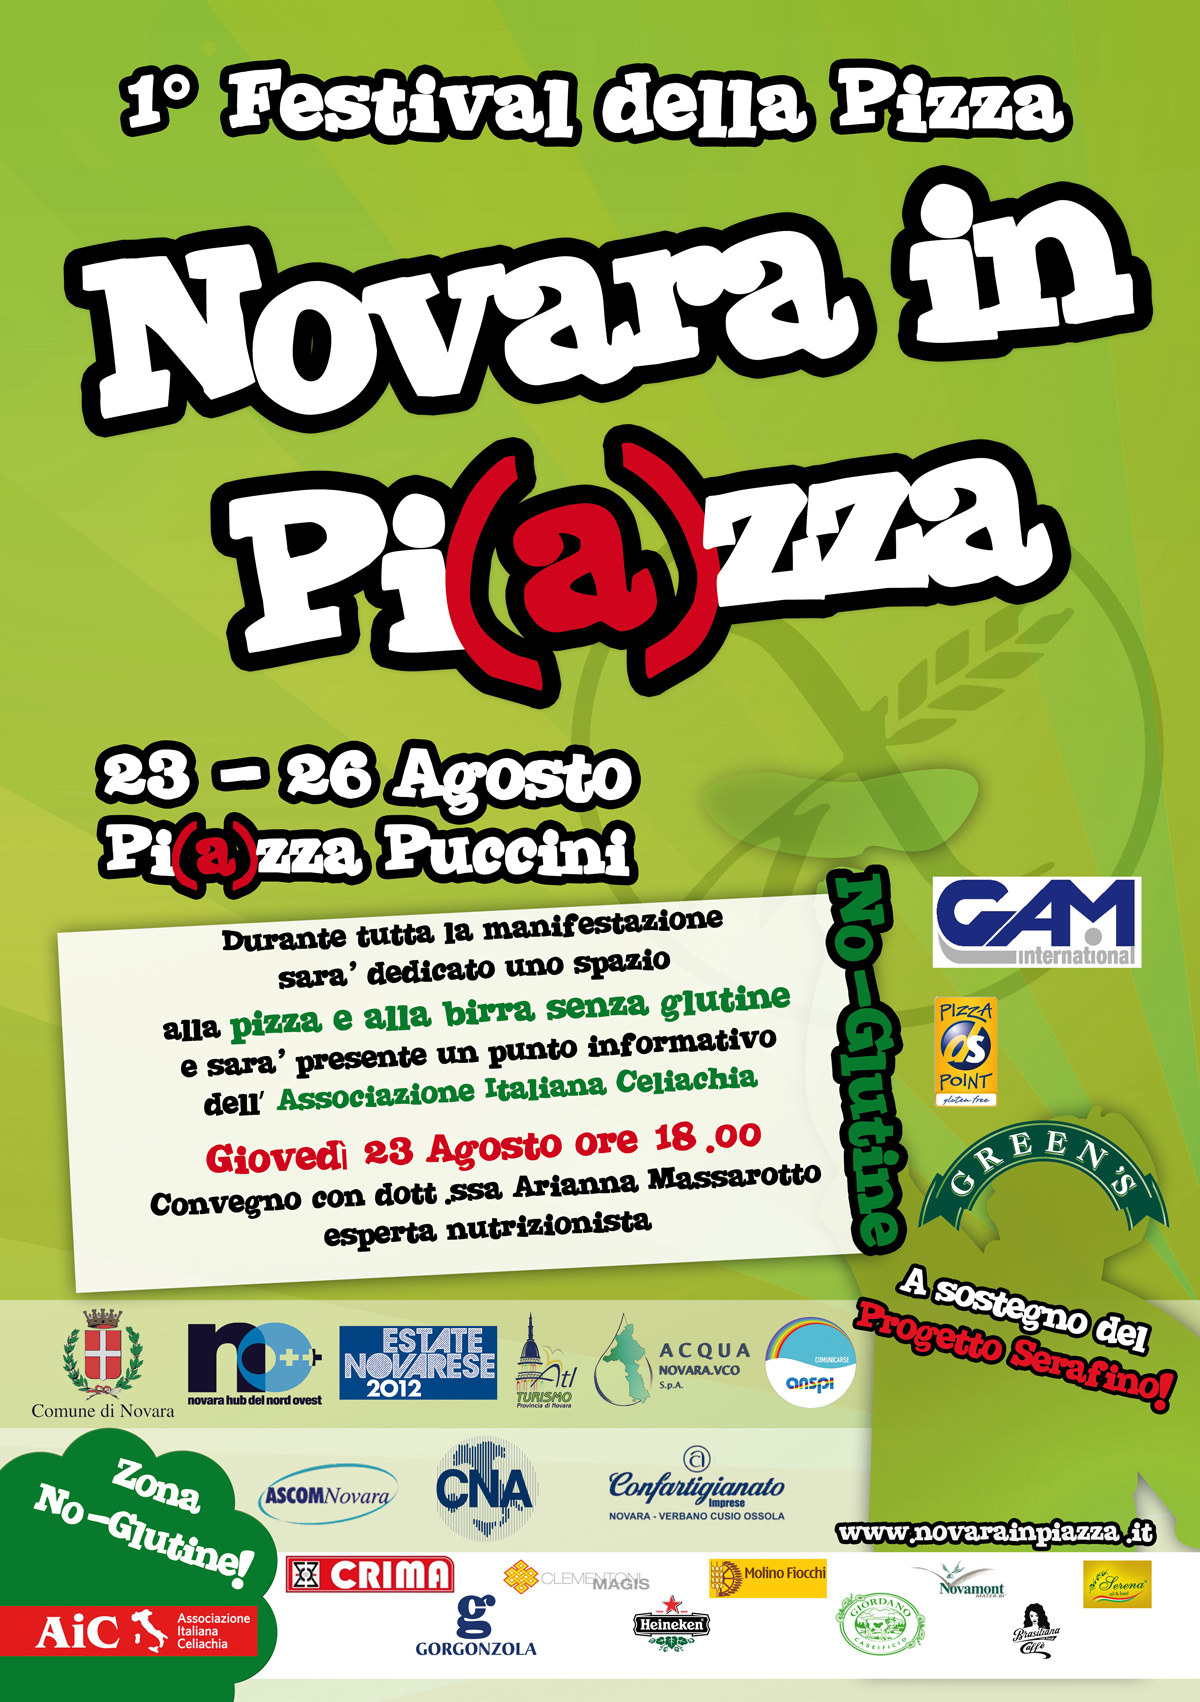 NOVARA IN PI(A)ZZA - GREEN'S Sponsor del 1° Festival della Pizza di Novara